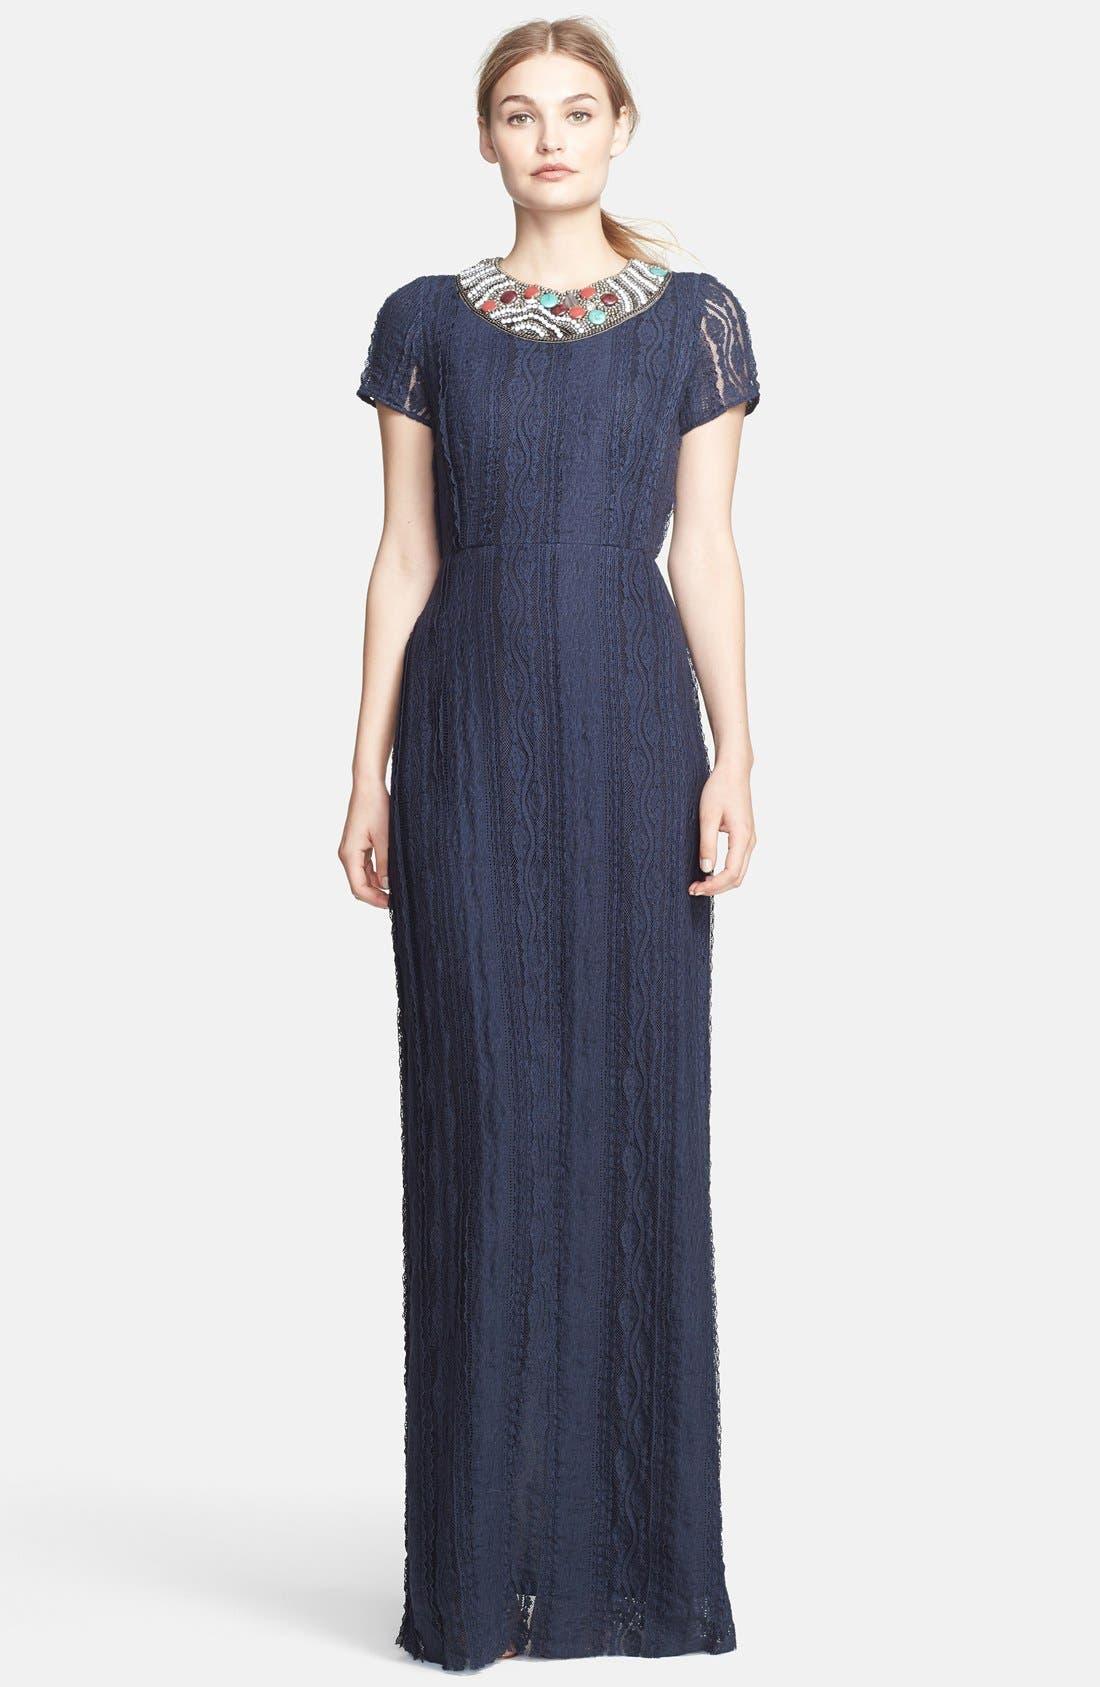 Main Image - Korovilas 'Georgia' Encrusted Neck Lace Maxi Dress